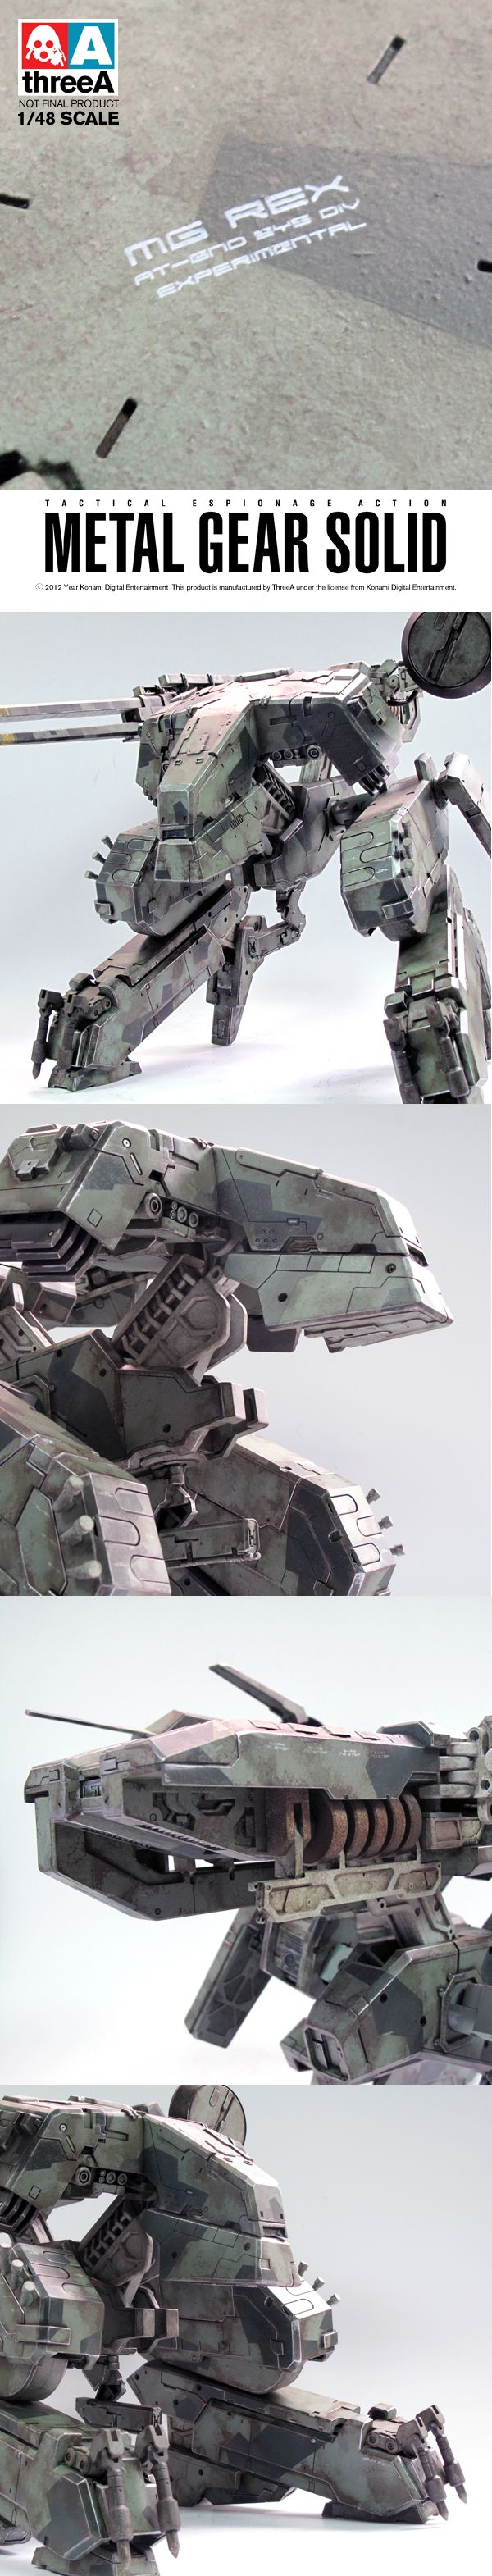 Meta Gear Rex 1/48 scale model from ThreeA ~ $400